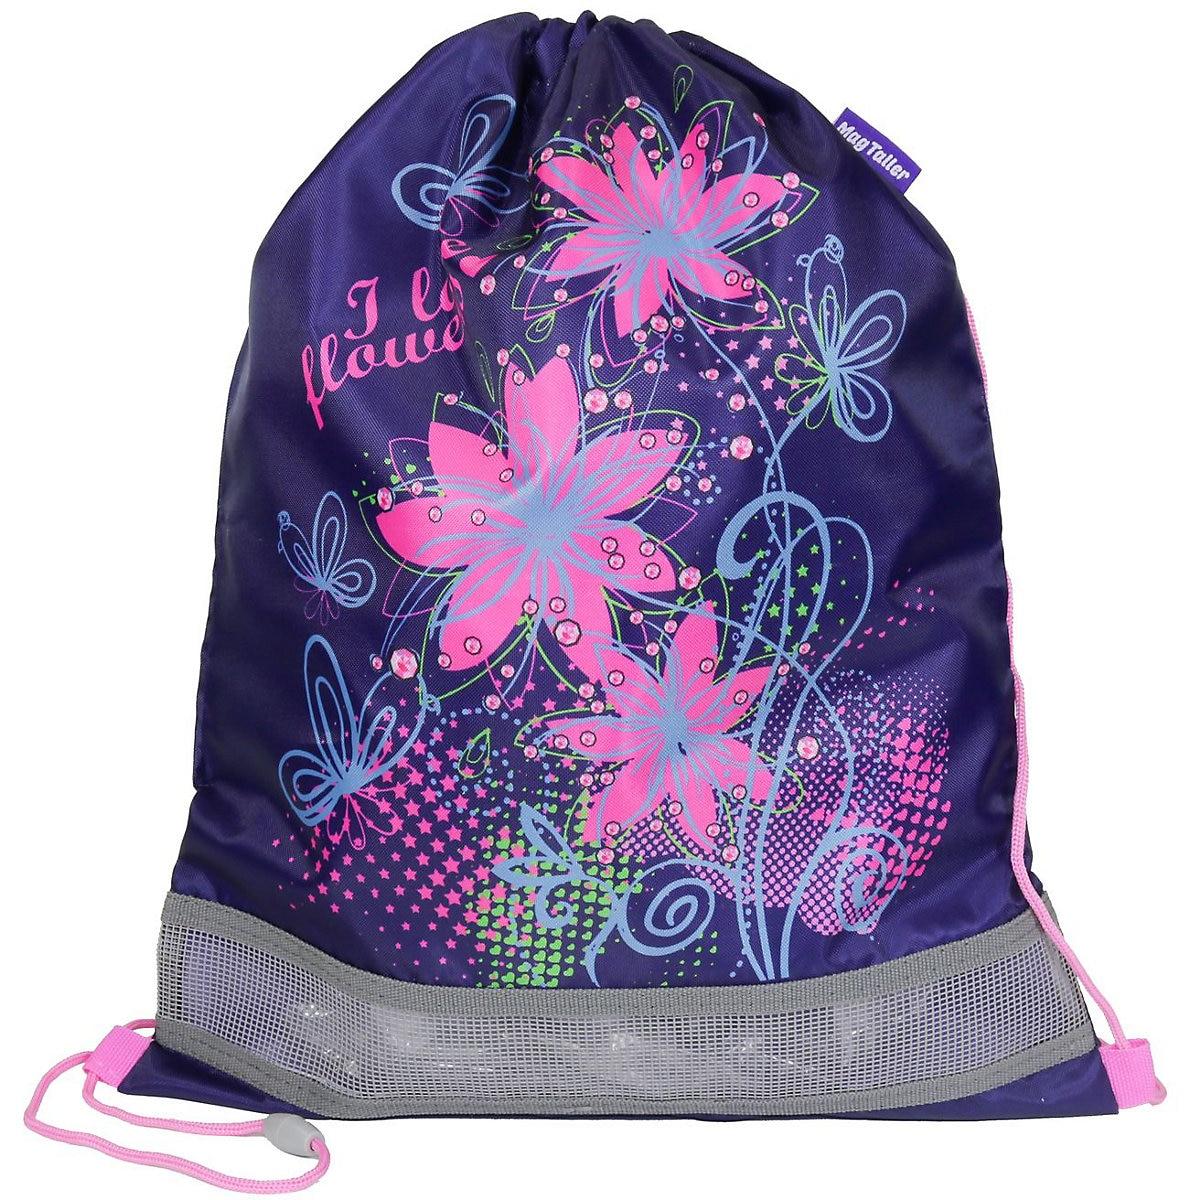 MAGTALLER Drawstring Bags 11154872 Girls Polyester Sports Backpack Shoes Bag MTpromo